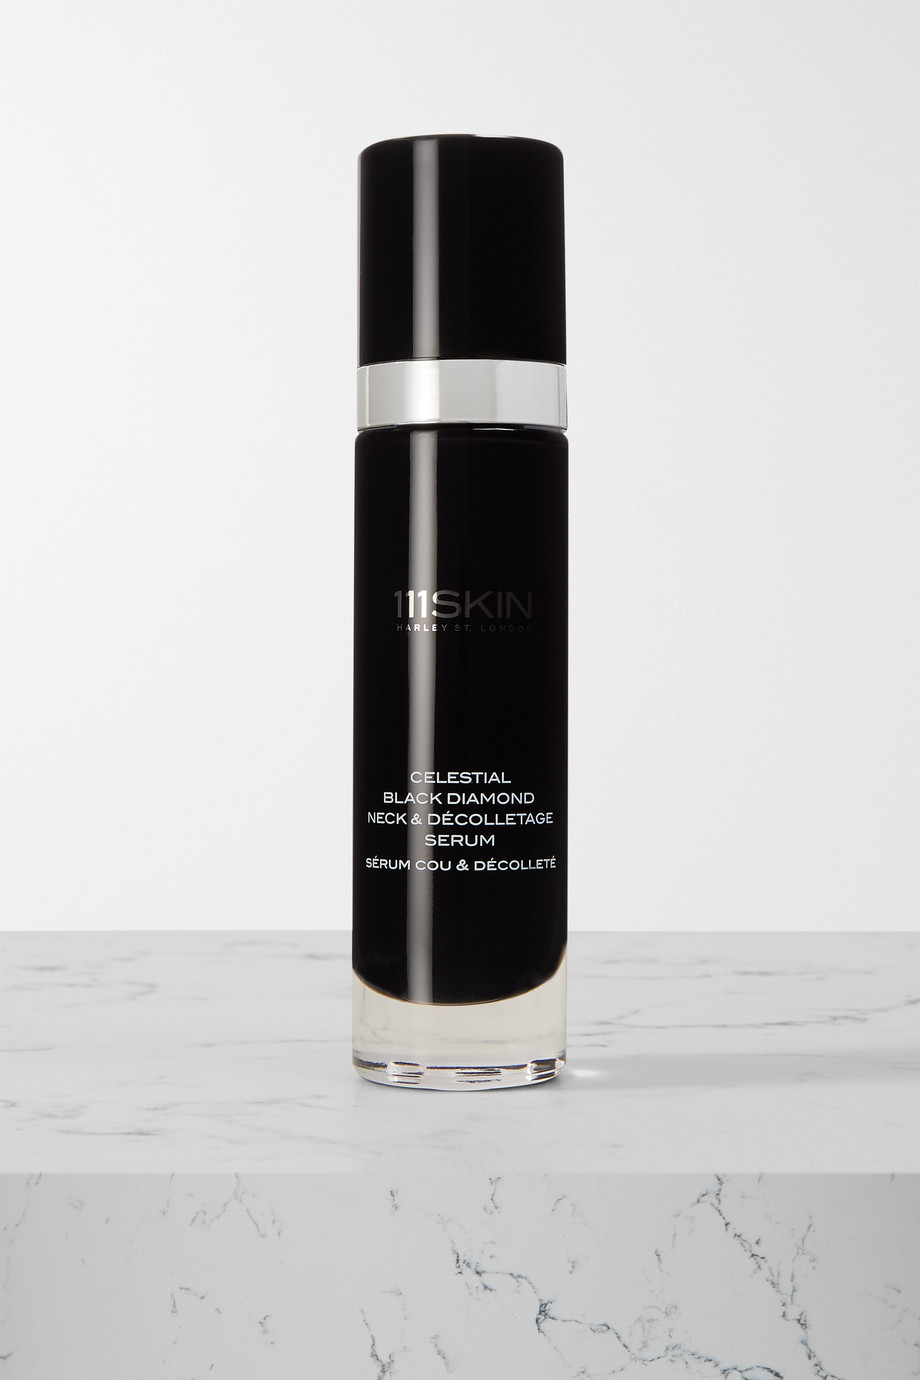 111SKIN Celestial Black Diamond Neck & Décolletage Serum, 50 ml – Serum